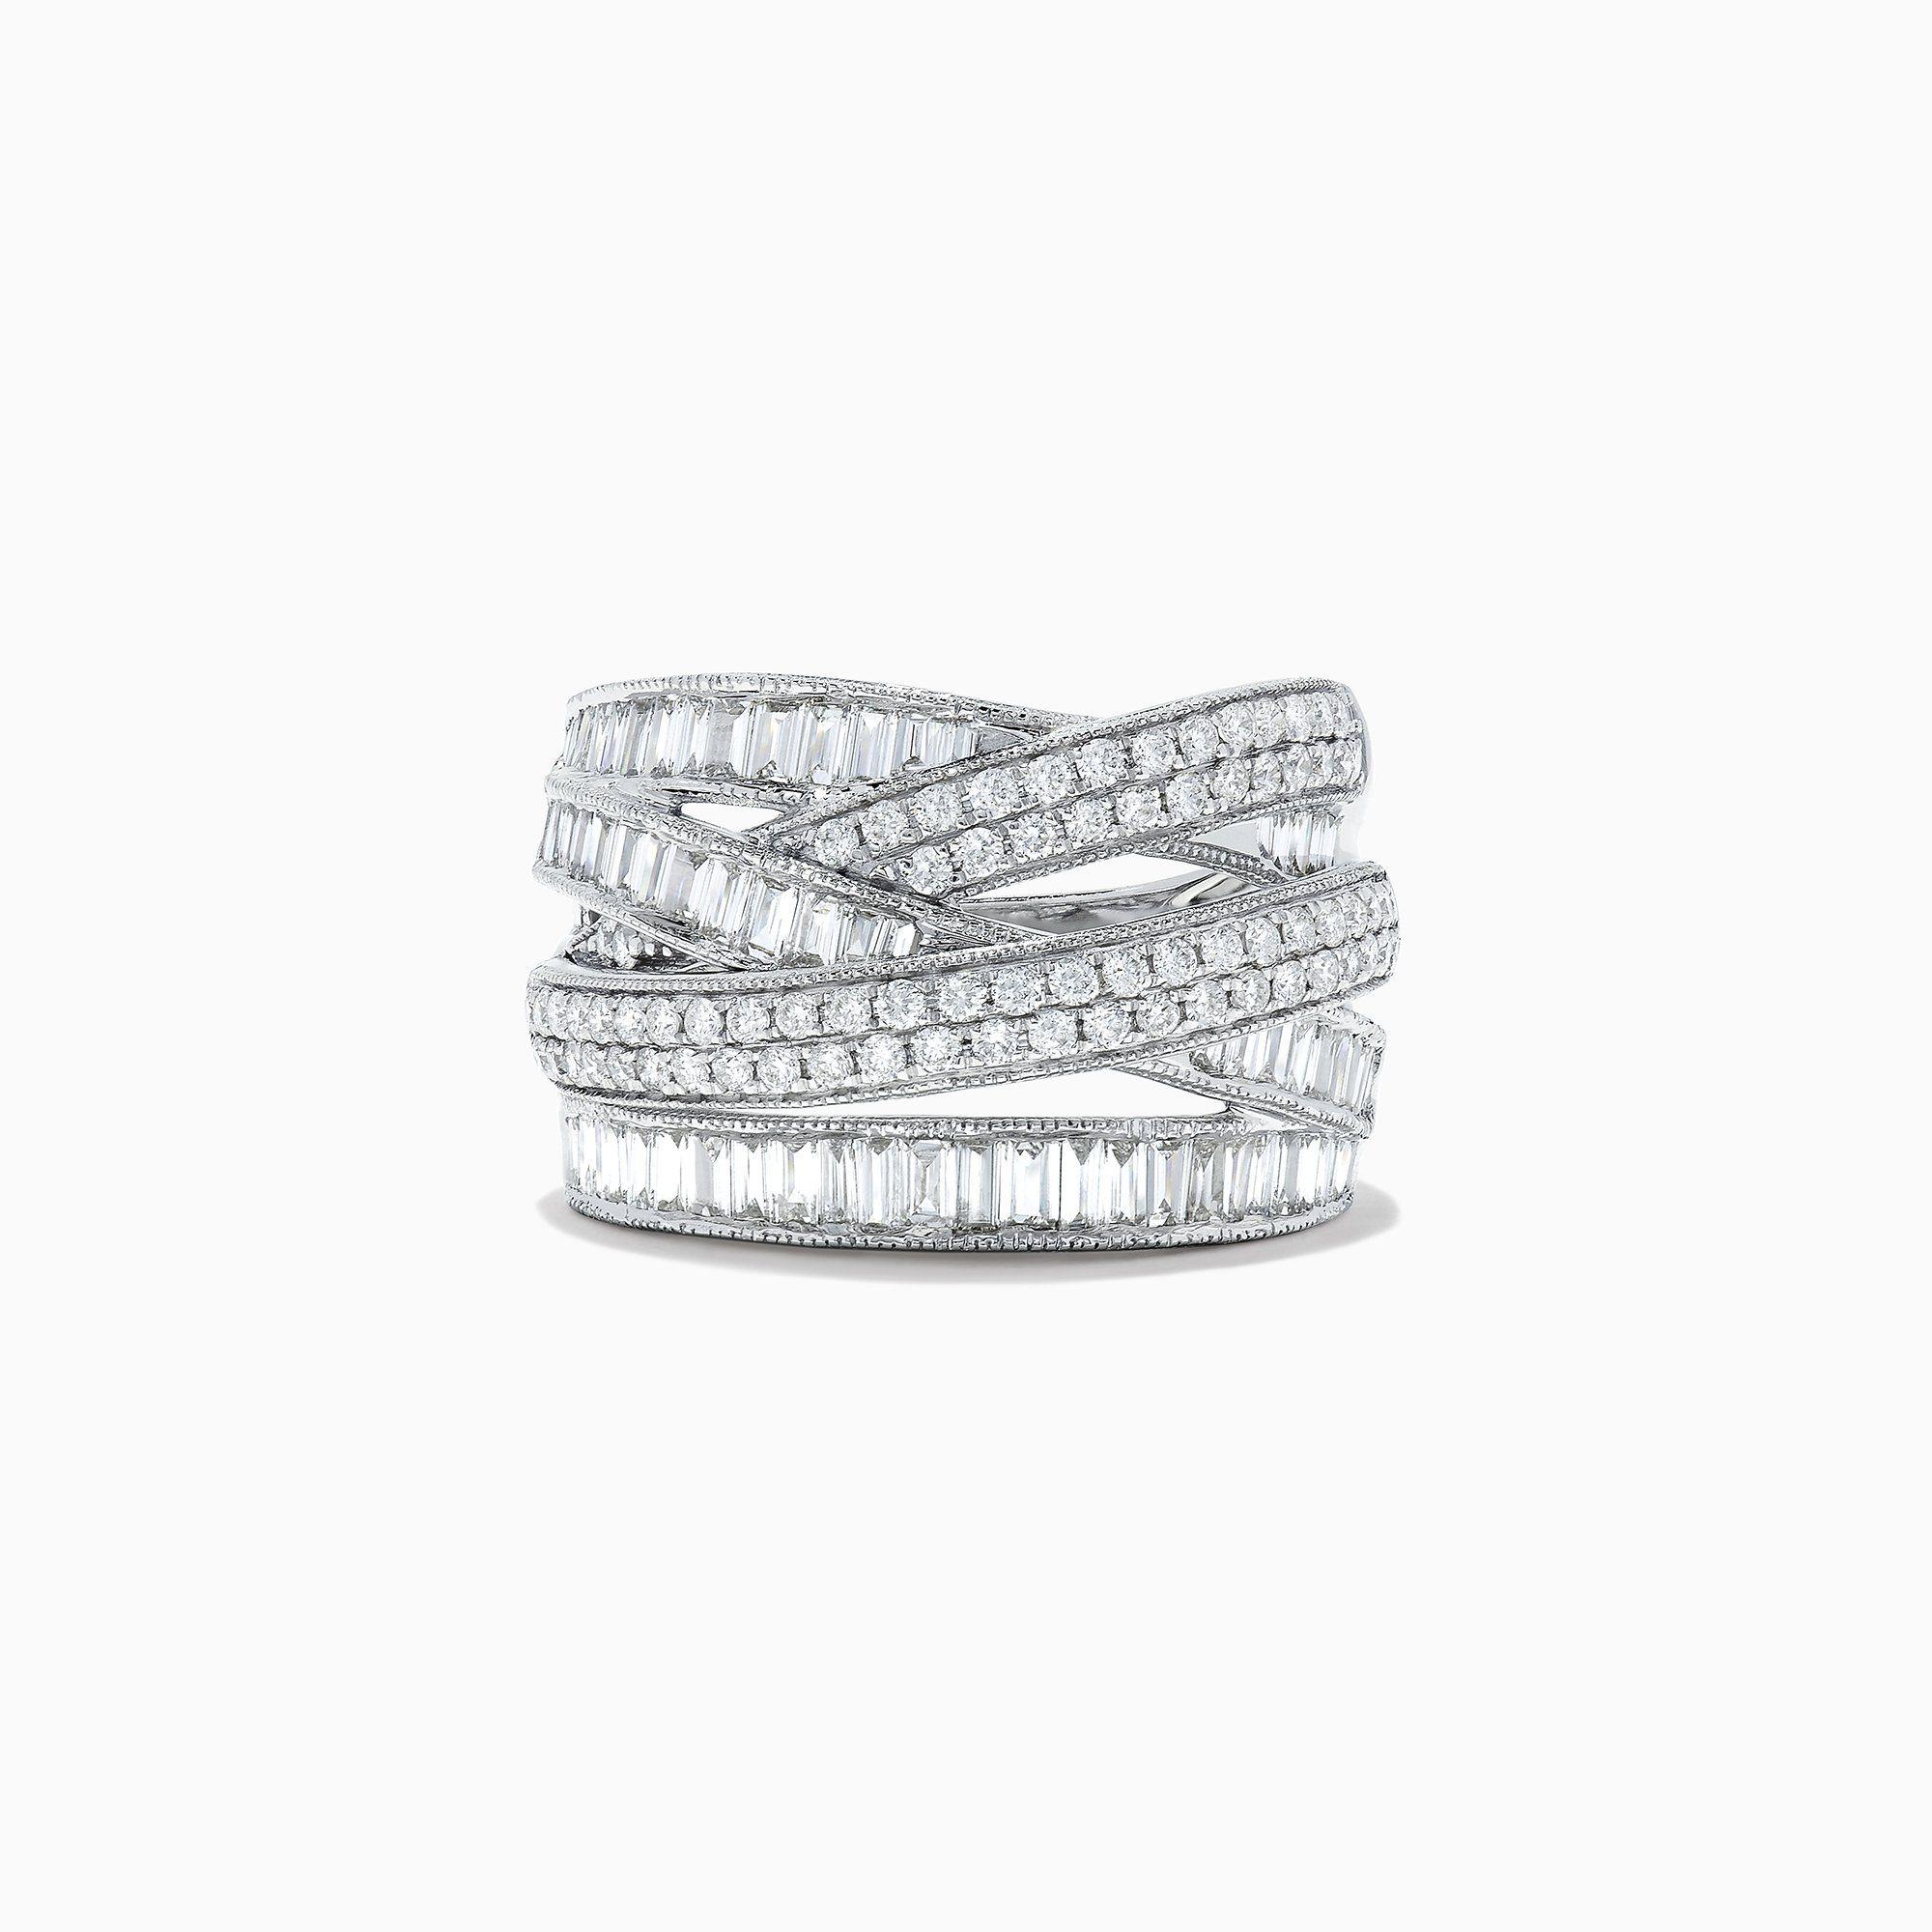 Effy Classique 14k White Gold Diamond Crossover Ring 1 47 Tcw In 2020 Crossover Diamond Ring White Gold Diamond Rings White Gold Diamonds